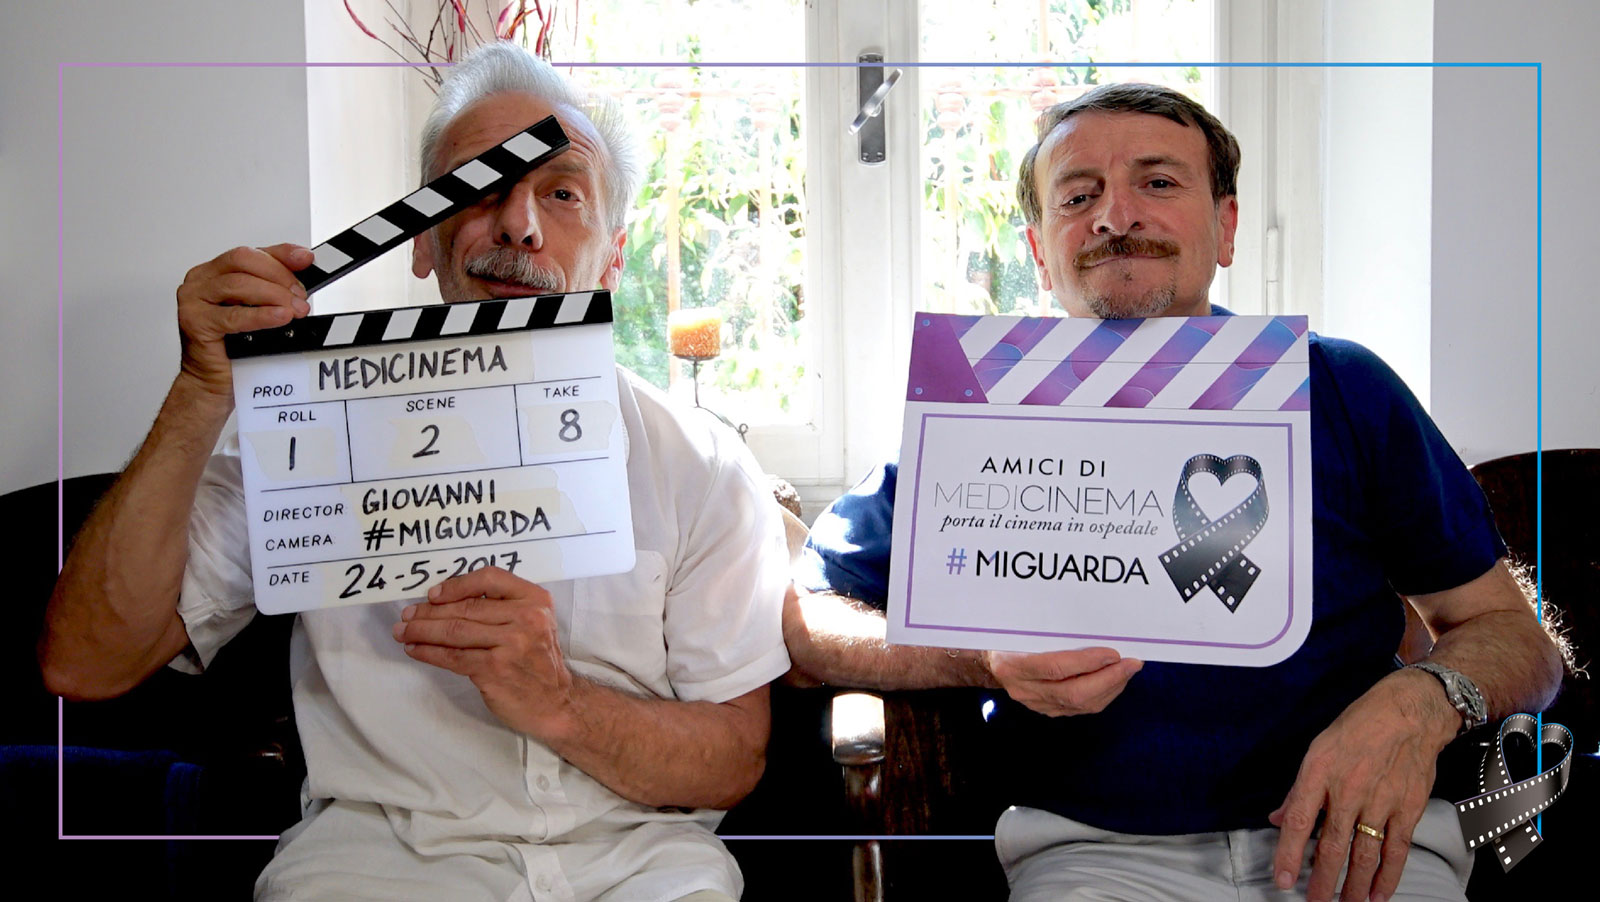 Giovanni e Giacomo Niguarda